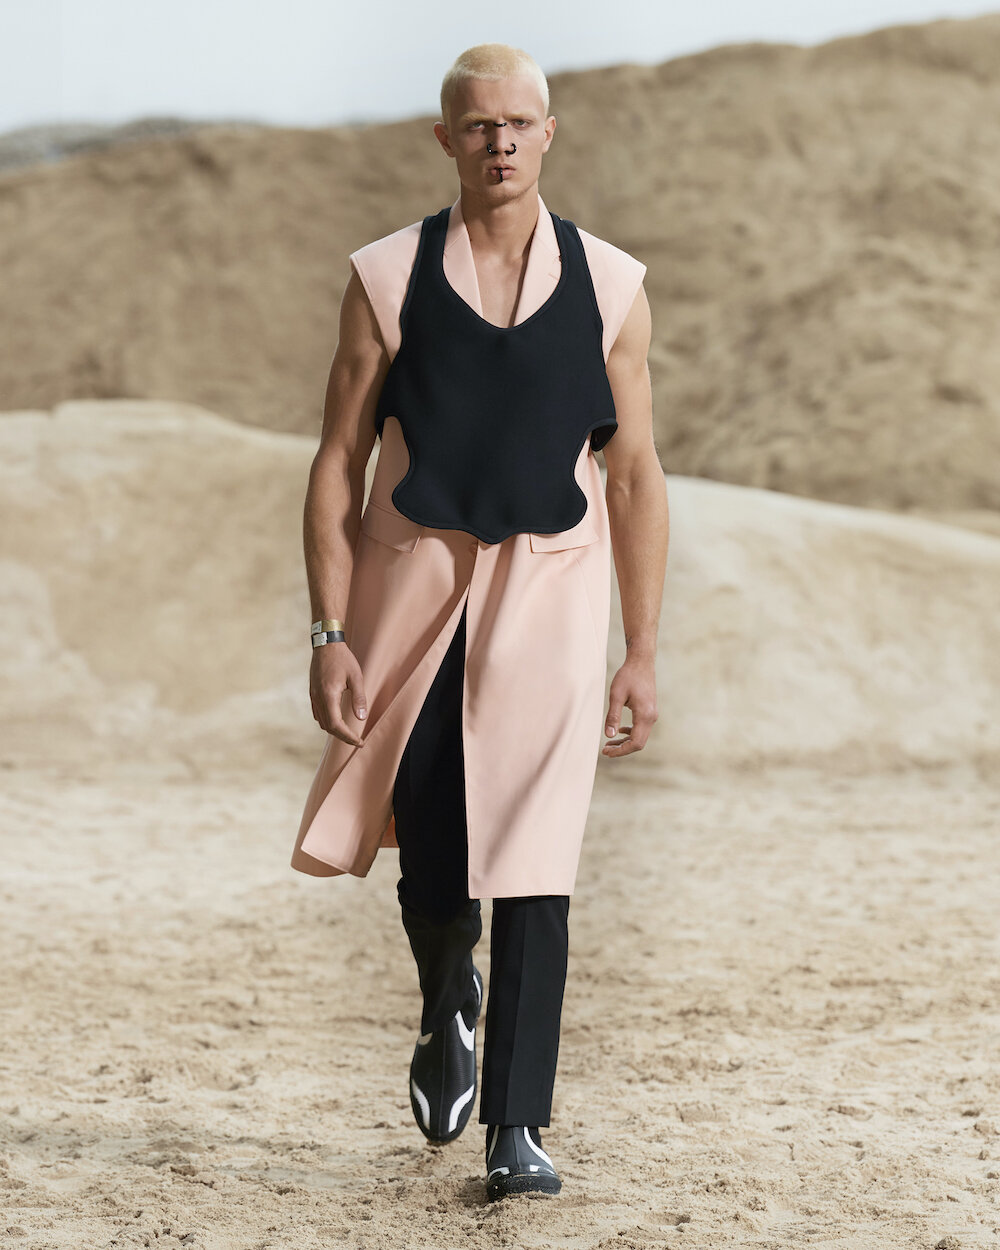 Burberry Spring_Summer 2022 Menswear Presentation Collection - Look 6 - Erik.jpg